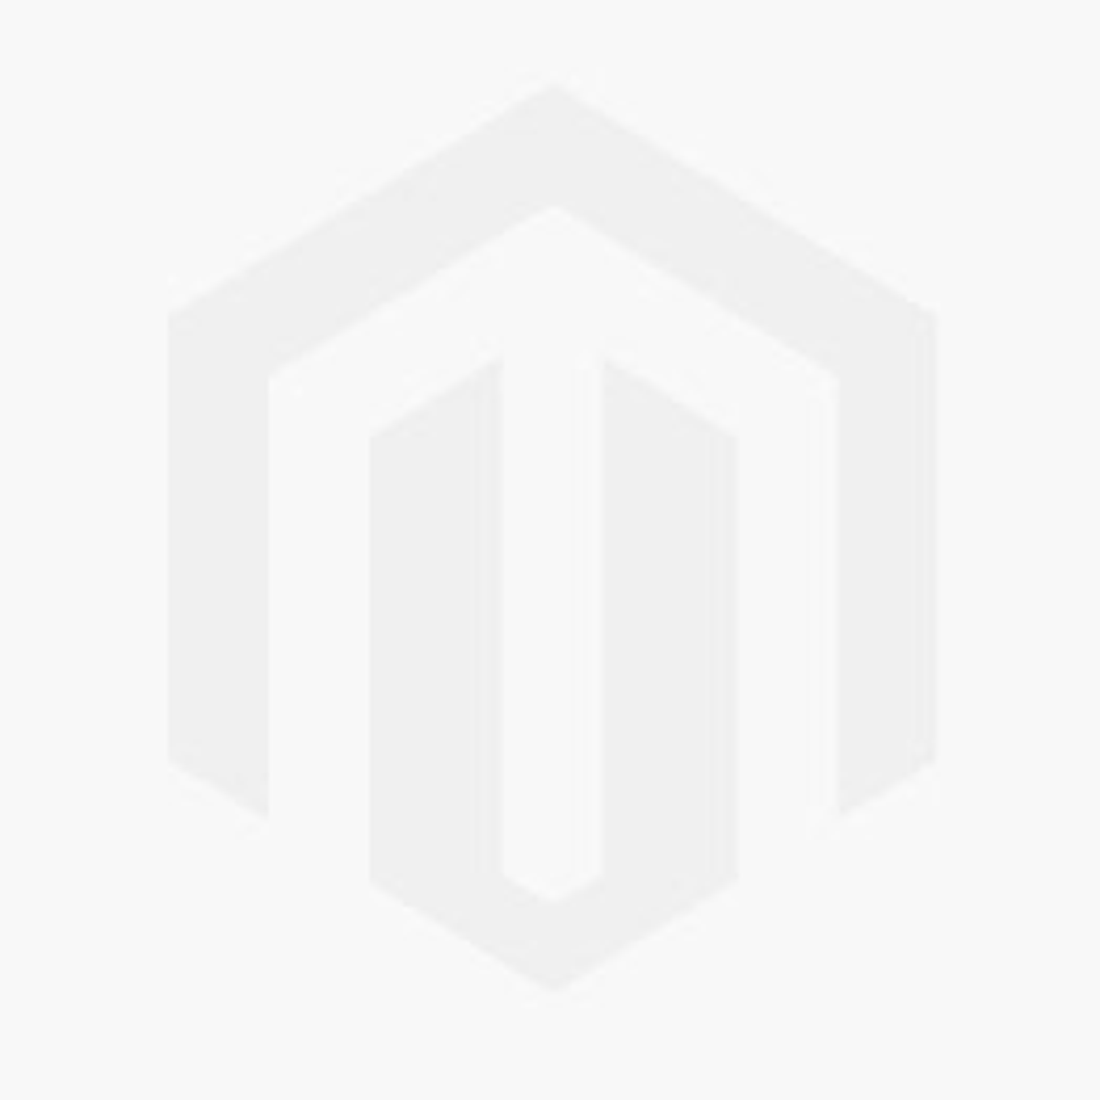 Albert Irvin OBE RA Untitled opus w.46